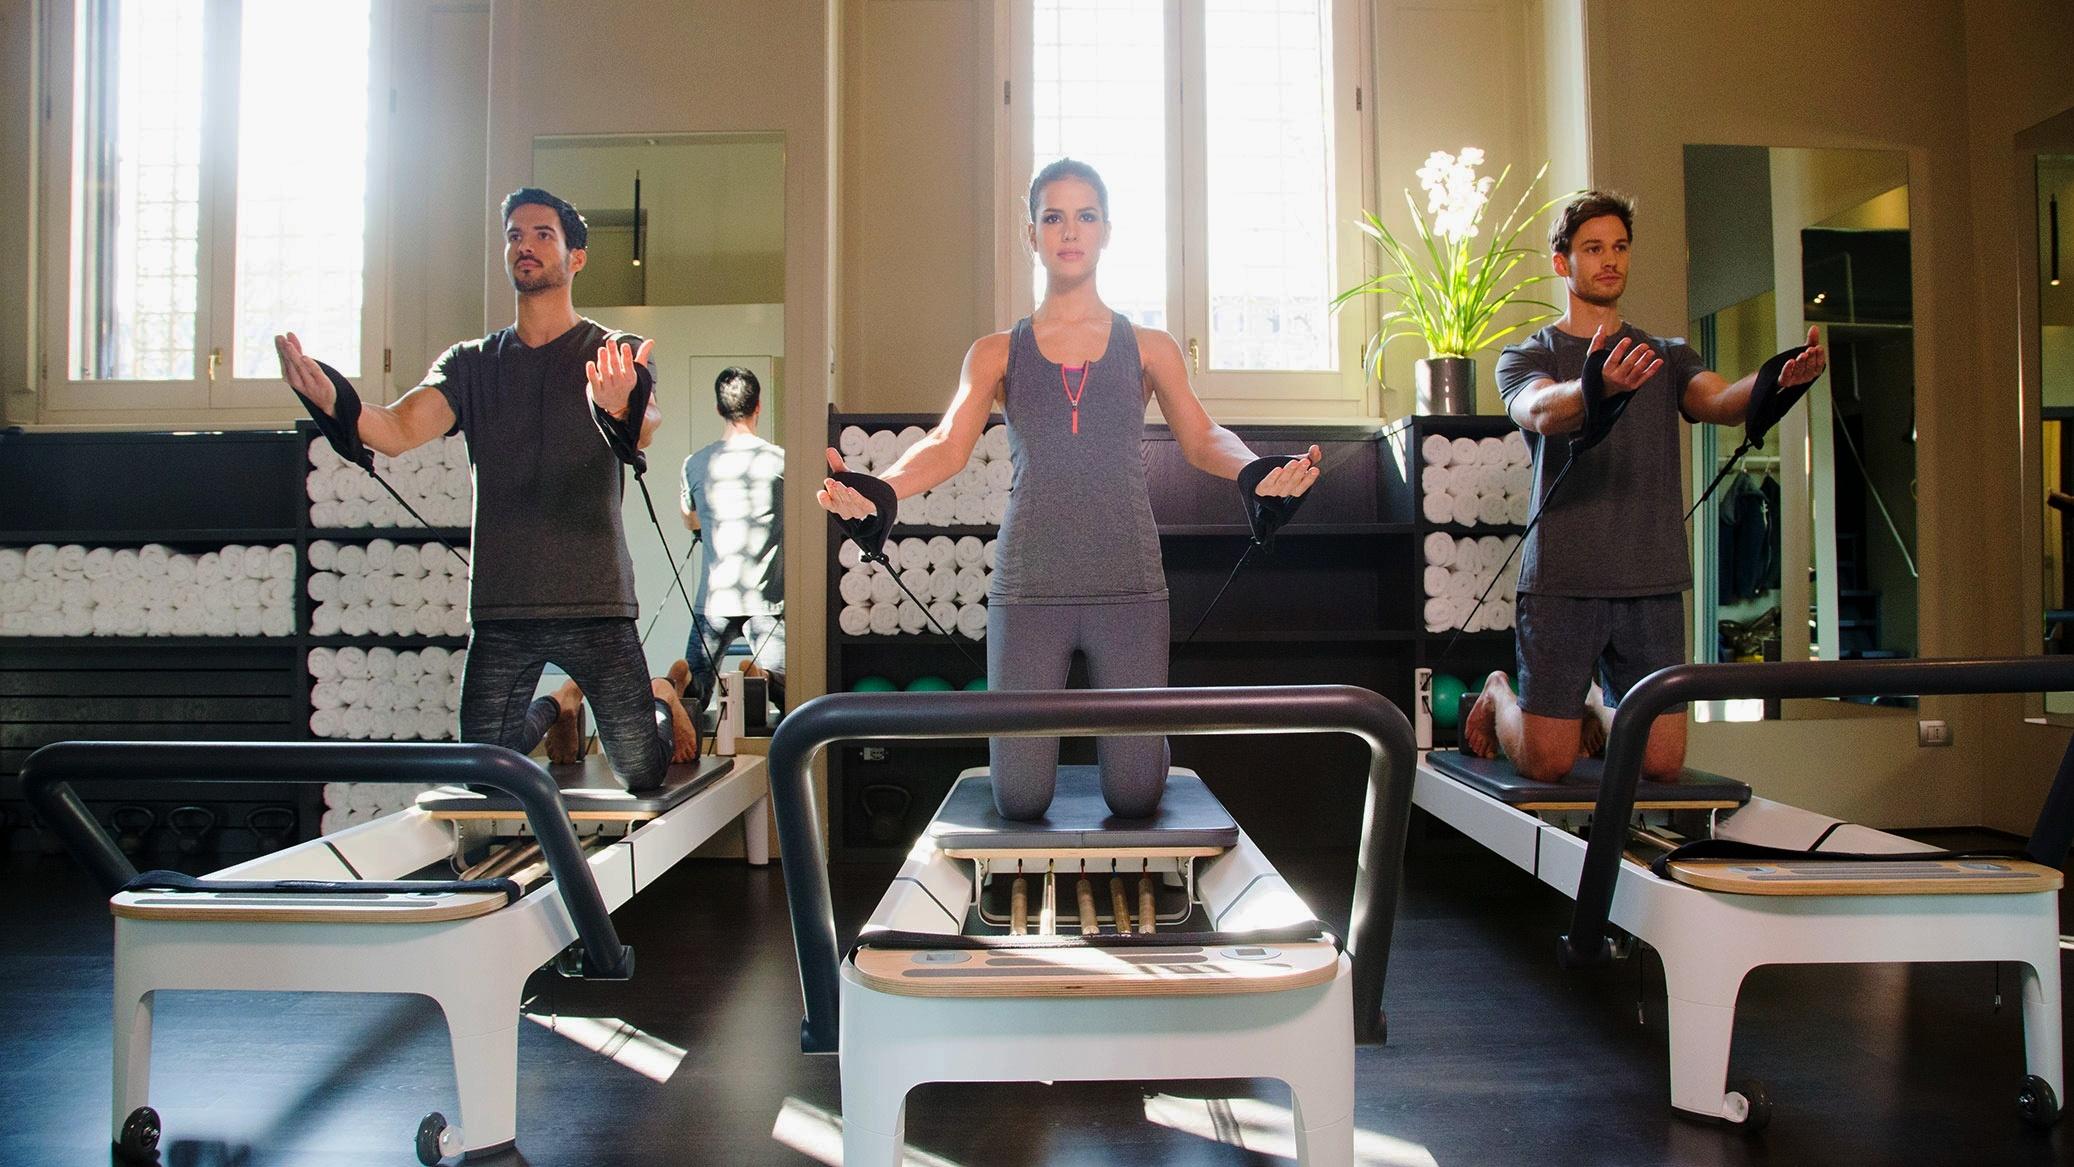 Sala-Vita-Boutique-Fitness-908250-edited